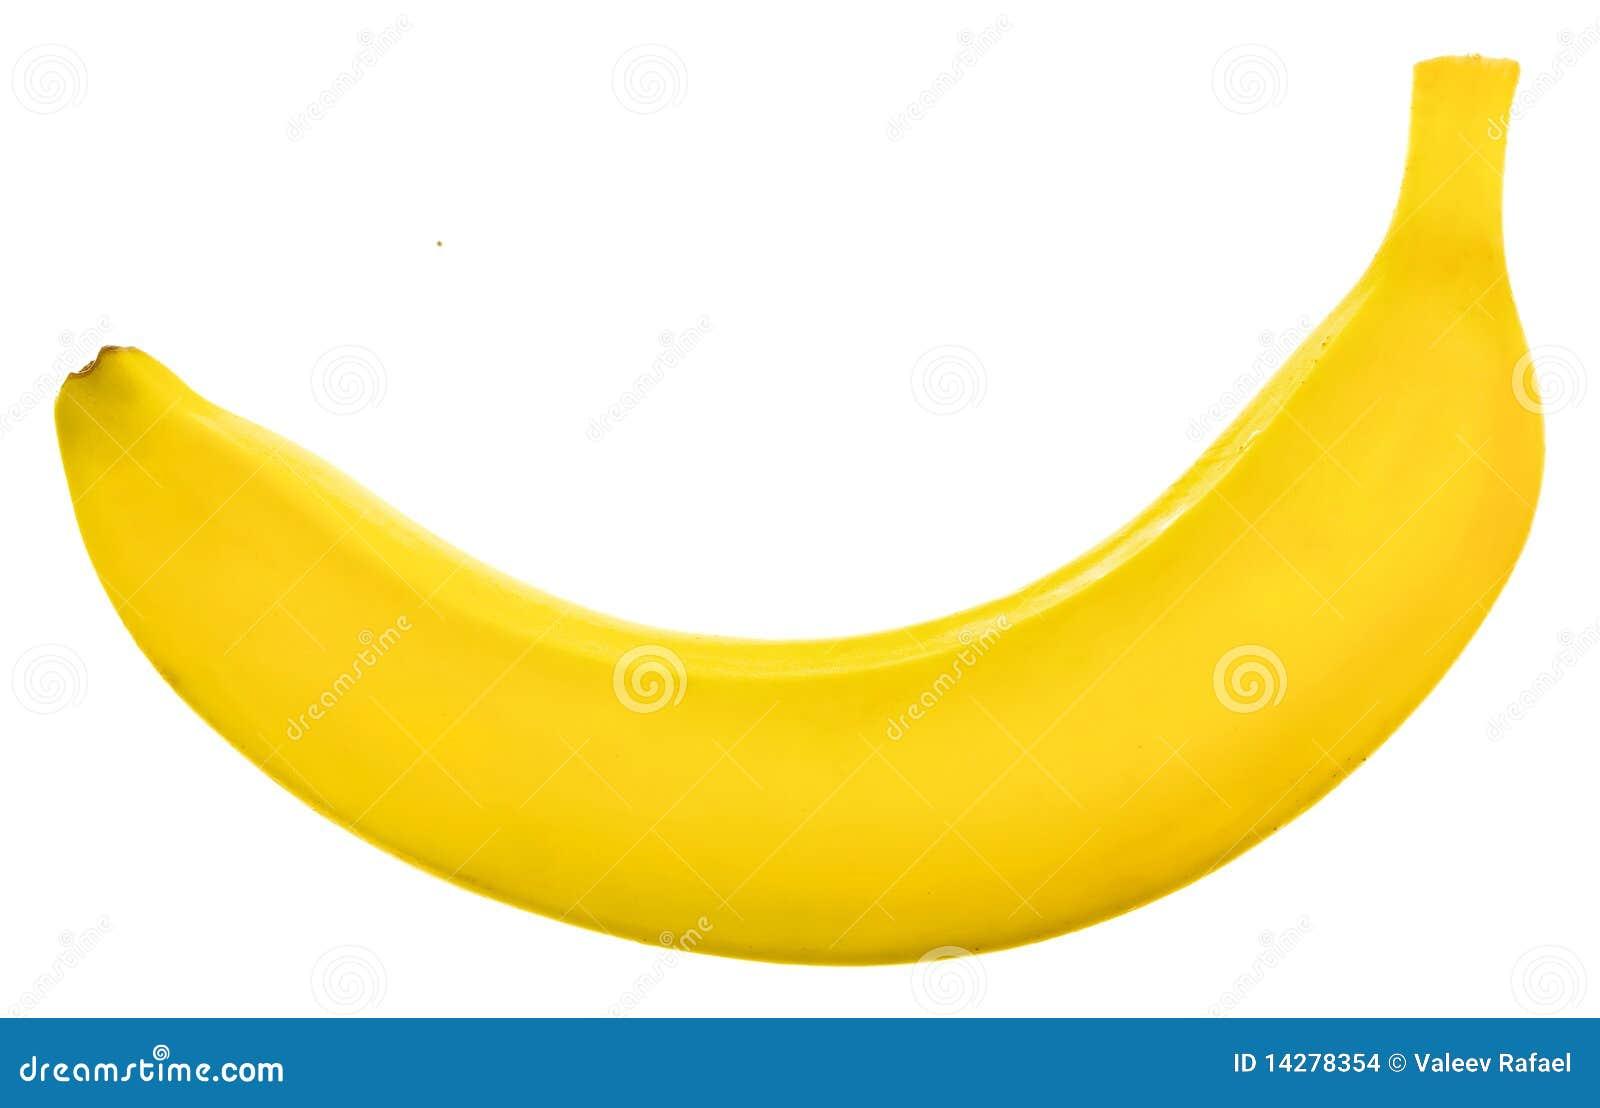 Yellow Banana Stock Images Image 14278354